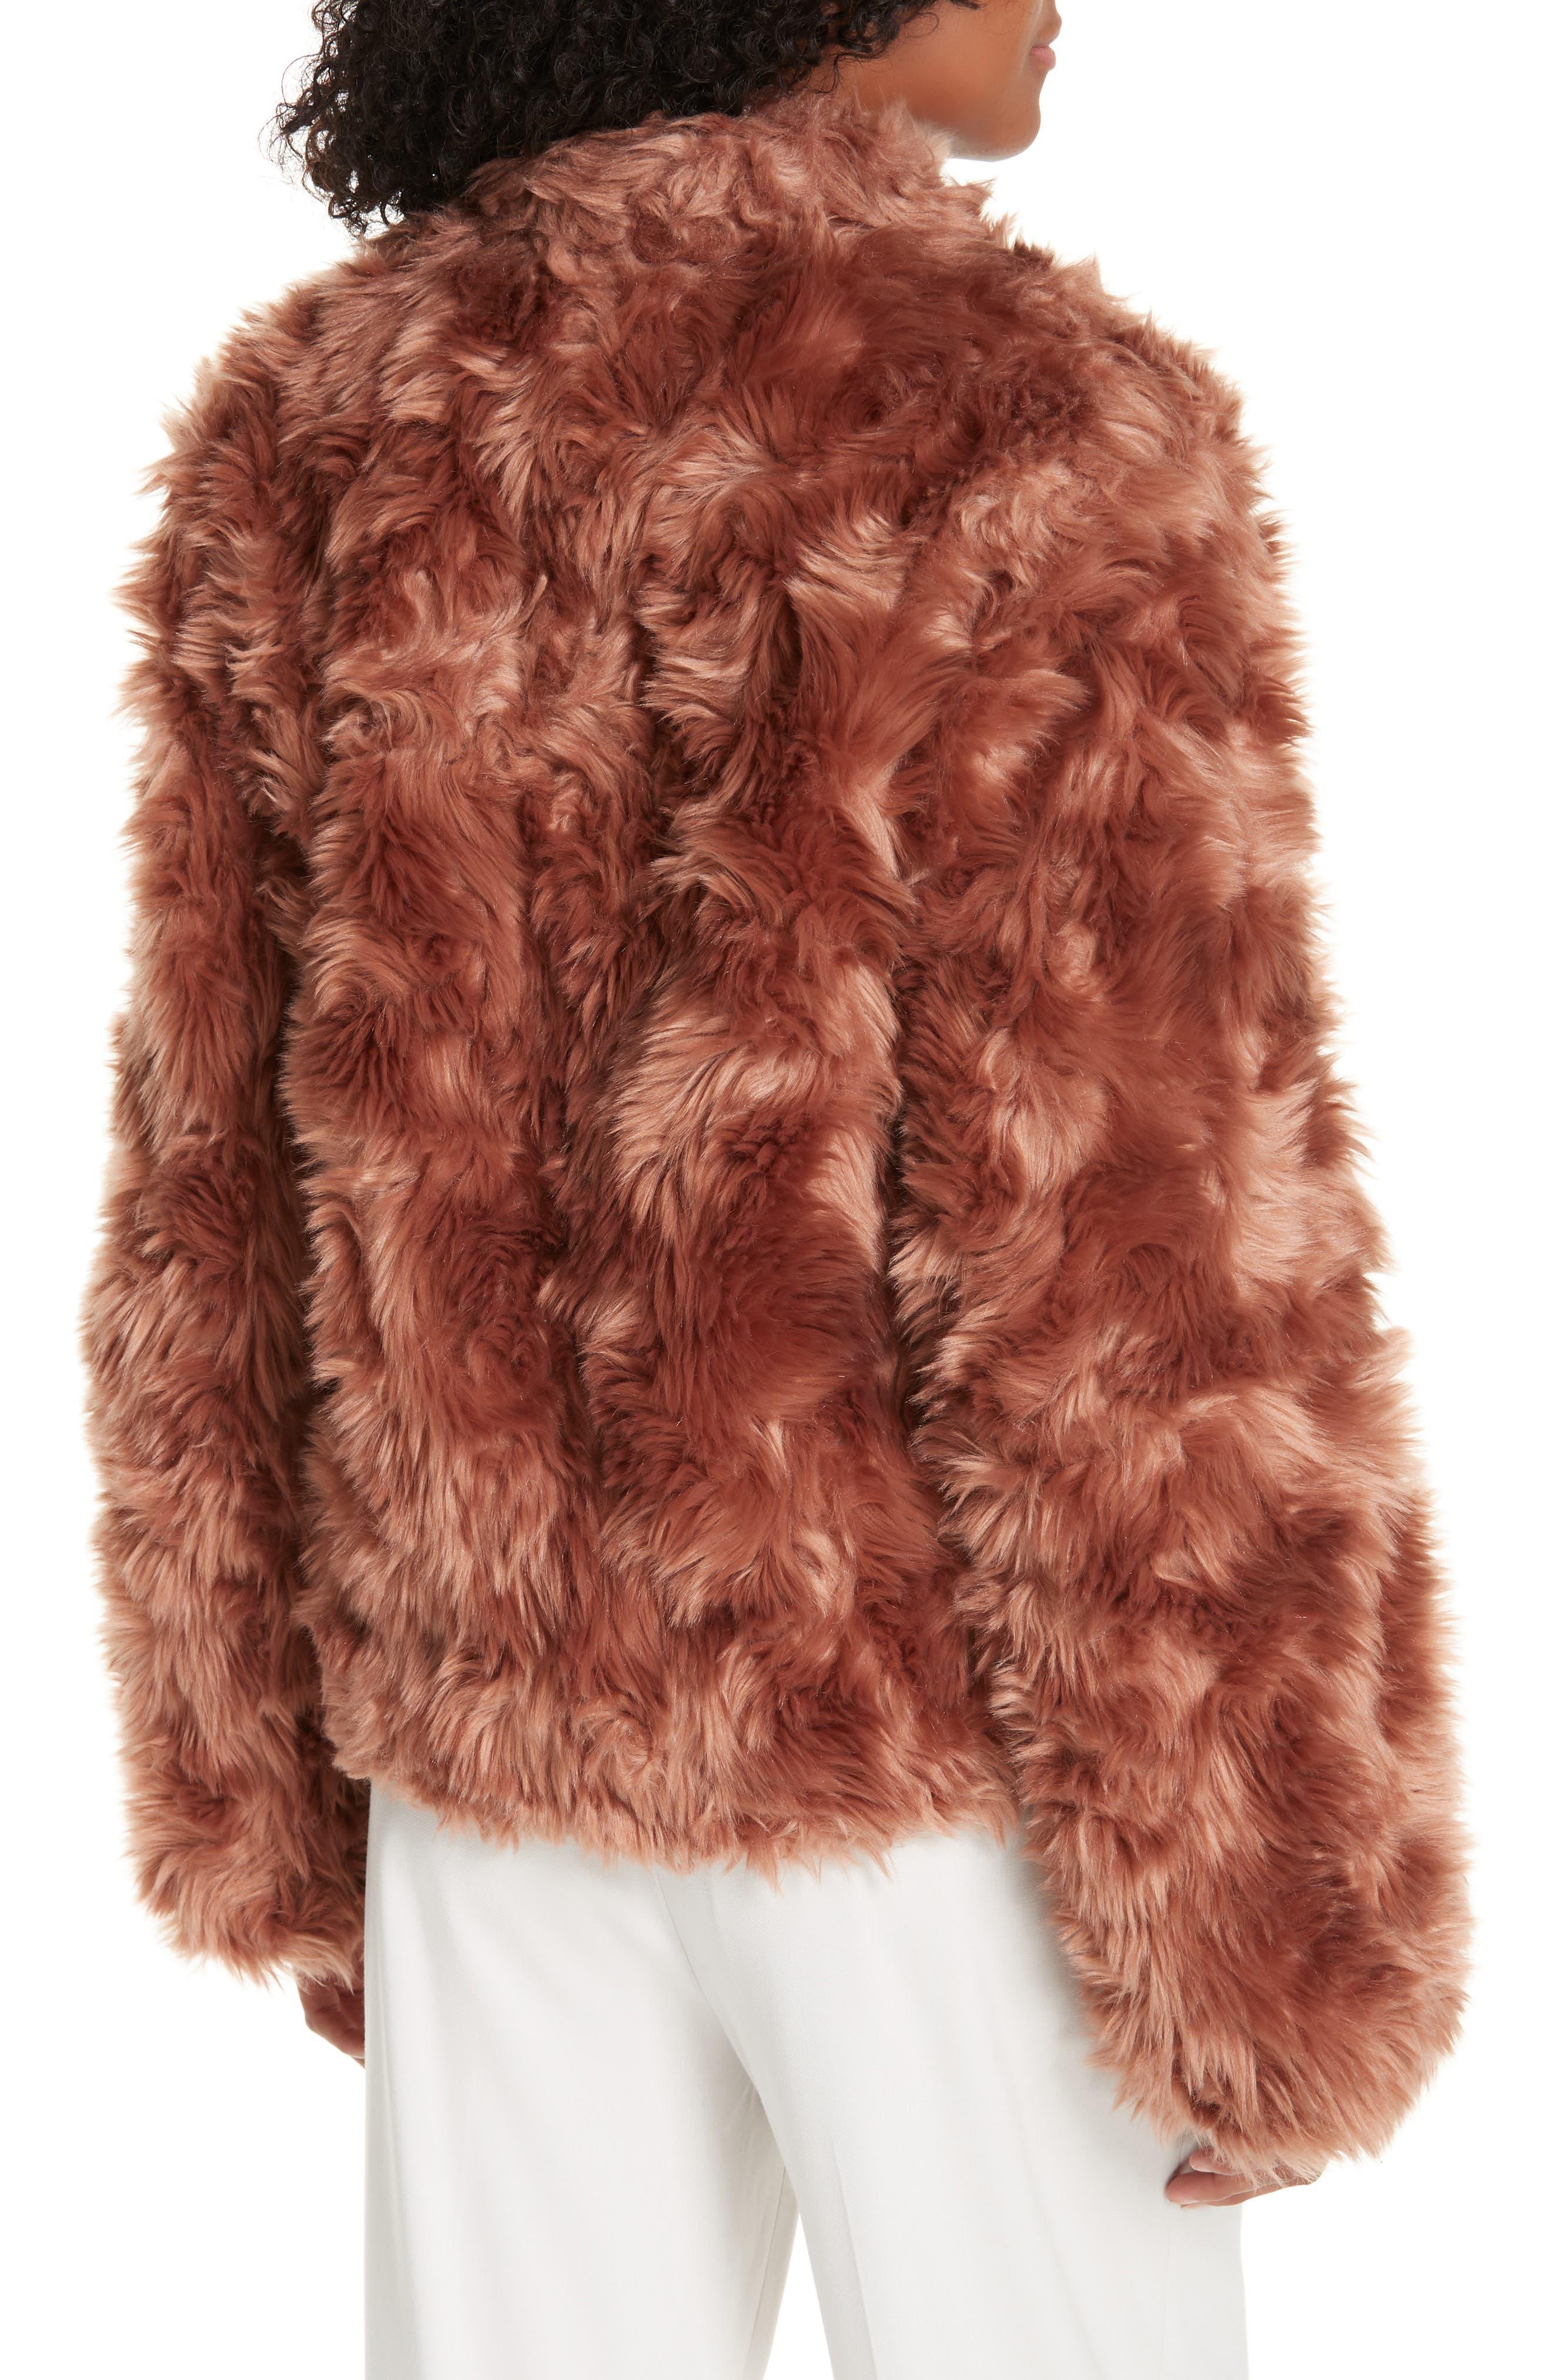 VINCE, Plush Faux Fur Jacket, Alternate thumbnail 2, color, PINK UMBER